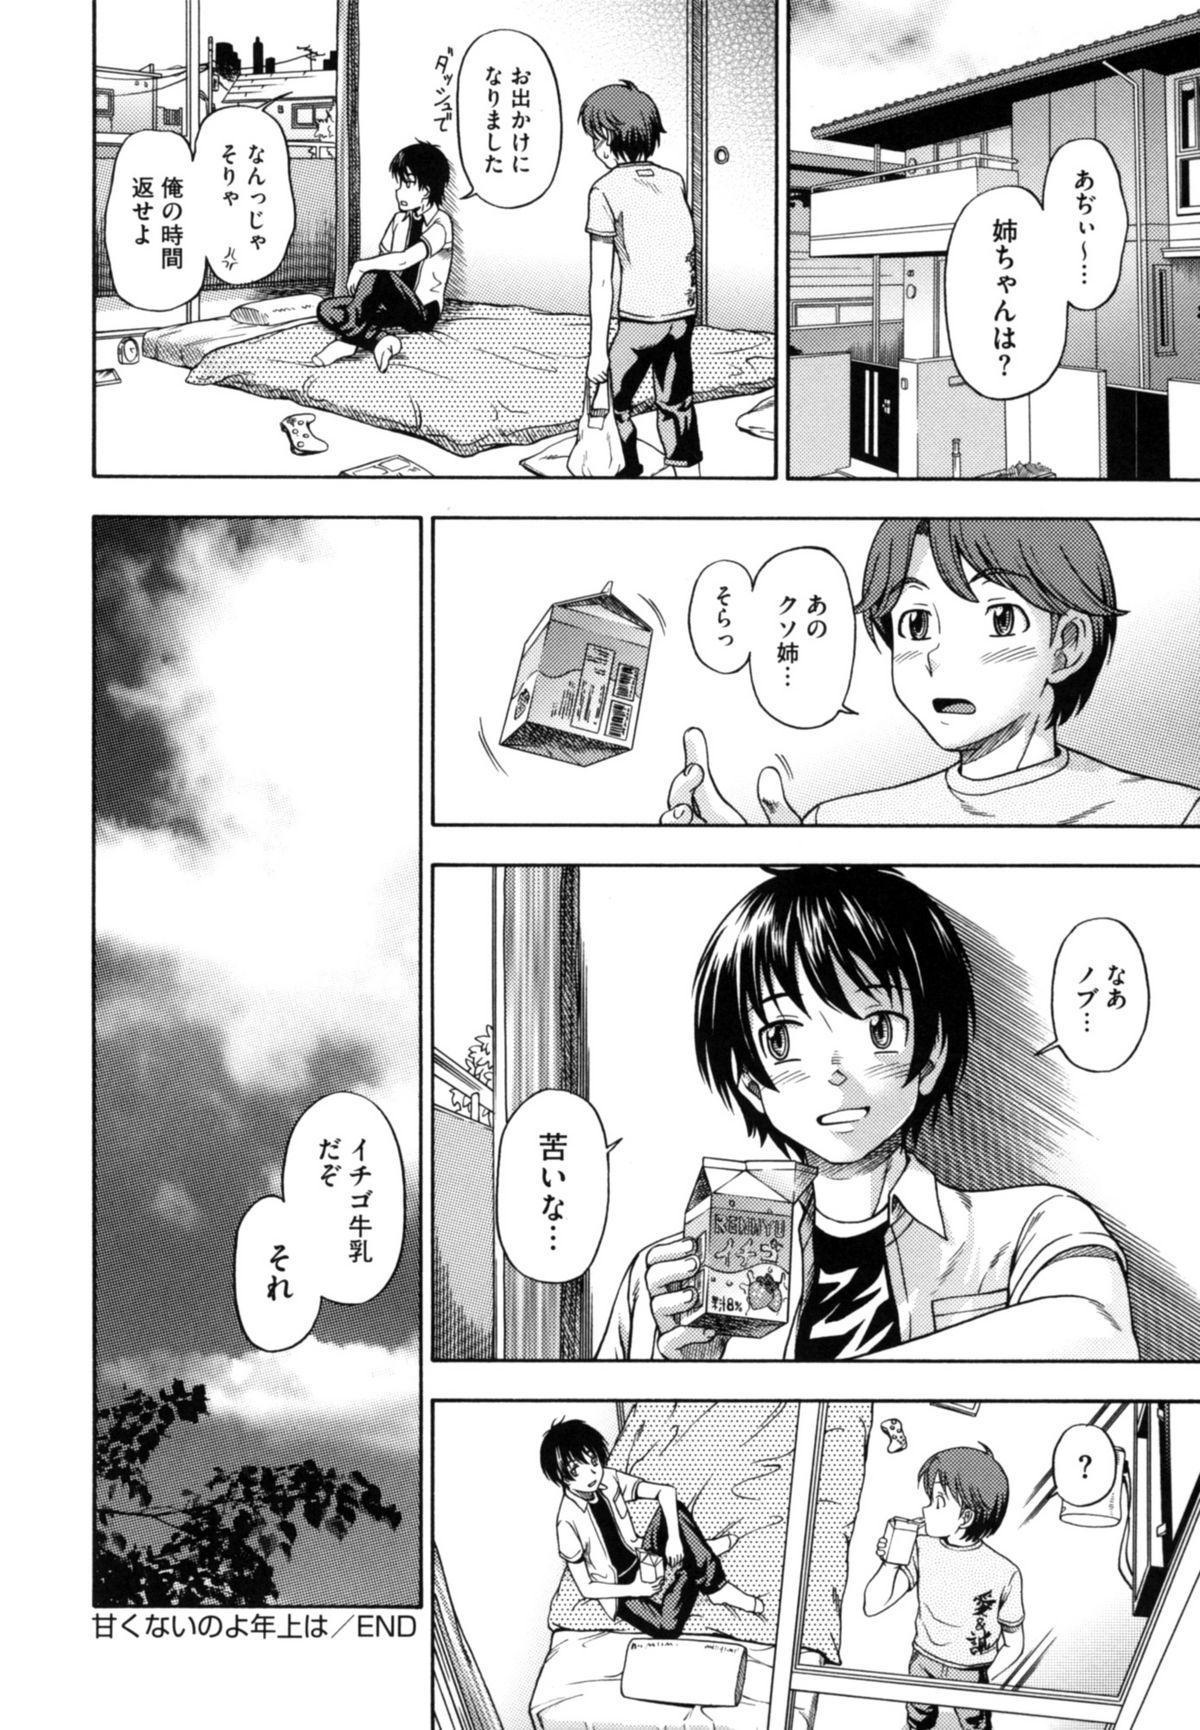 Soushisouai Note Nisatsume 157